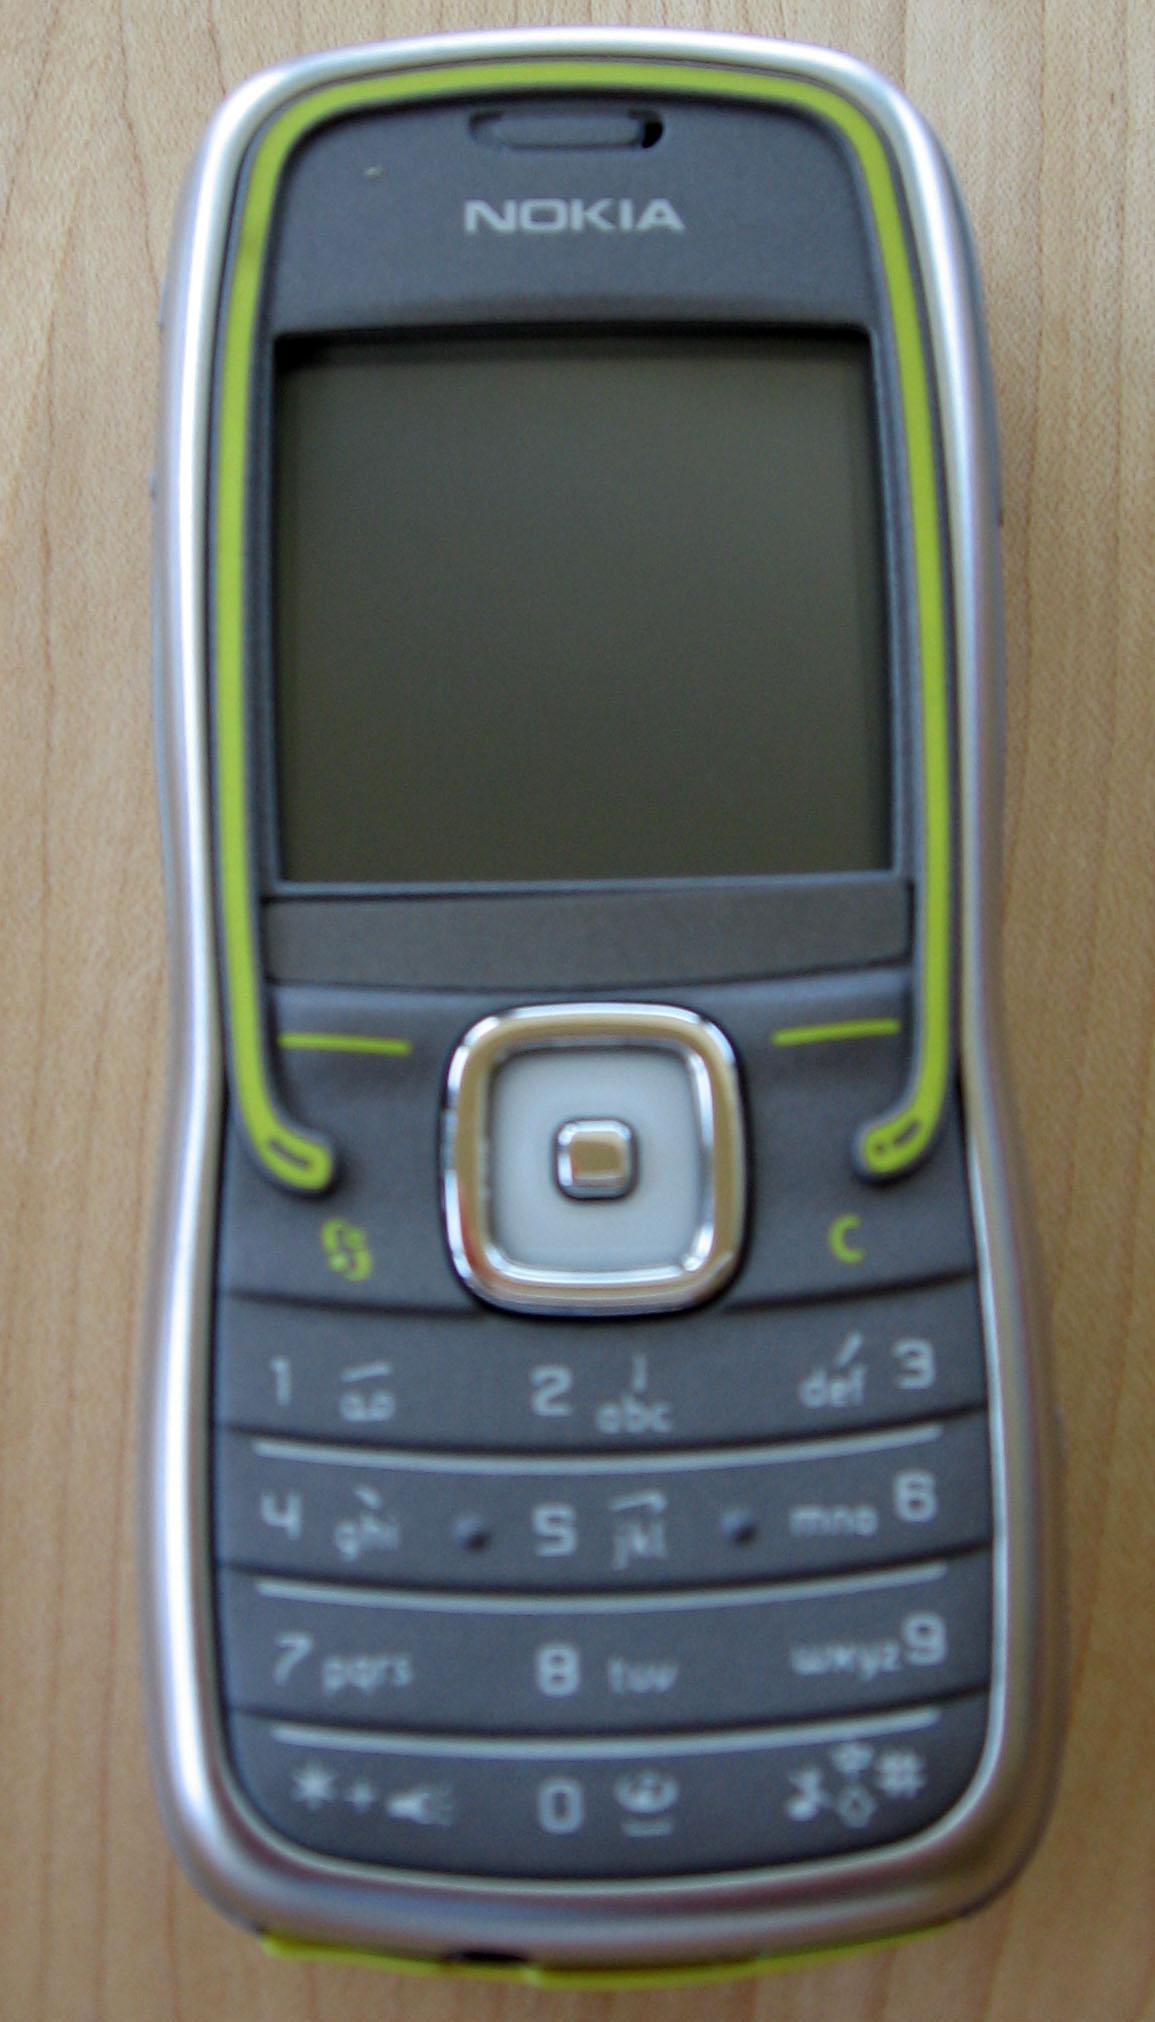 Nokia 5500 Sport Wikipedia